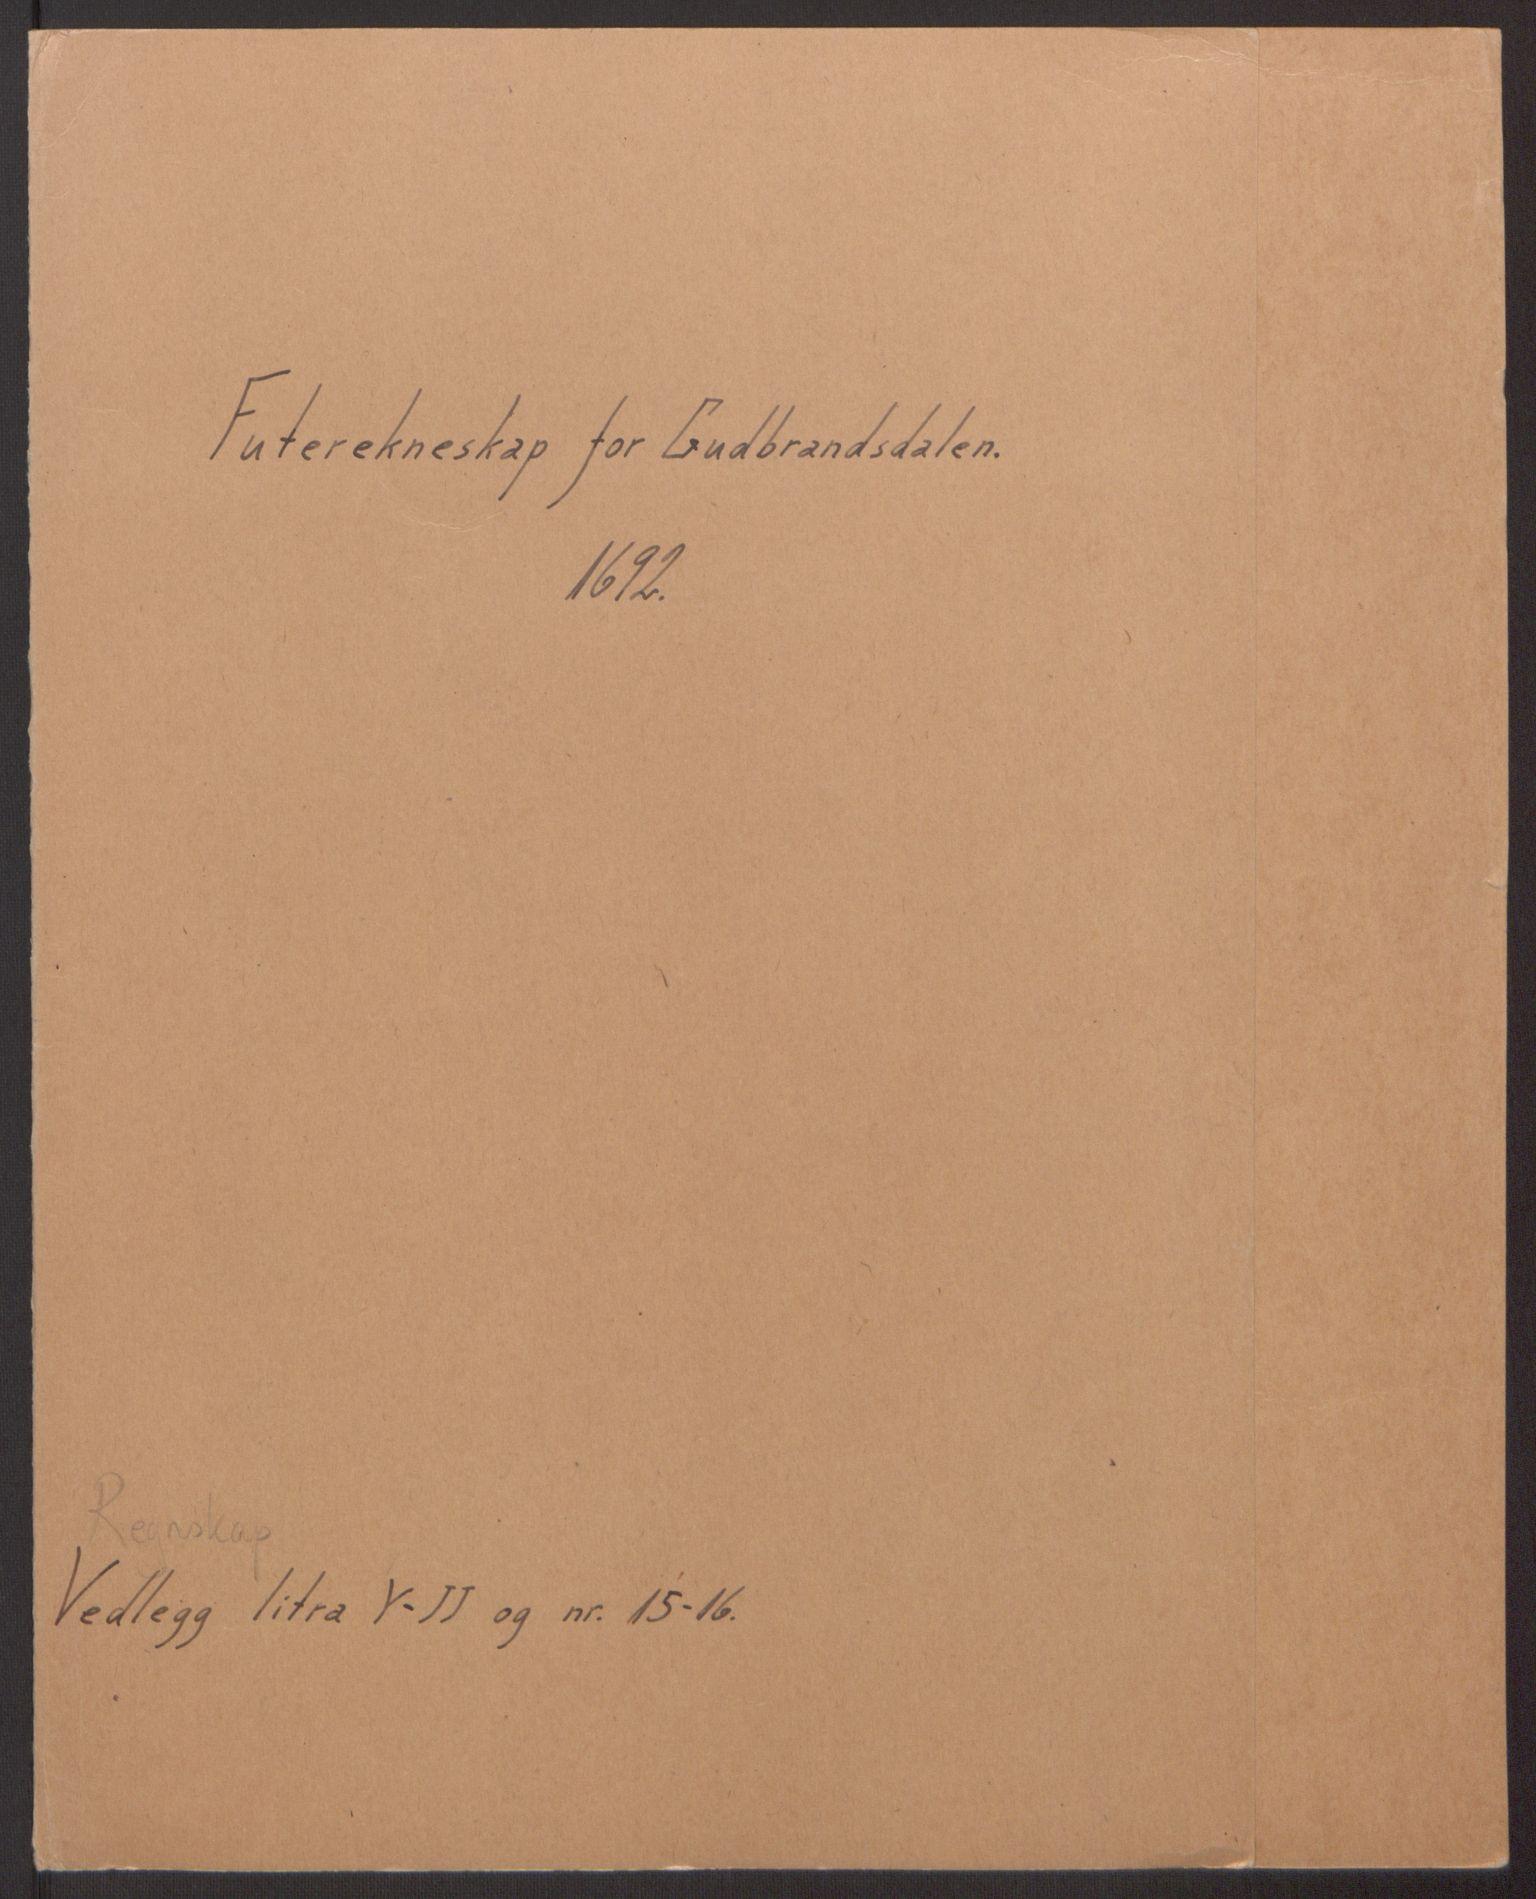 RA, Rentekammeret inntil 1814, Reviderte regnskaper, Fogderegnskap, R17/L1166: Fogderegnskap Gudbrandsdal, 1690-1692, s. 2